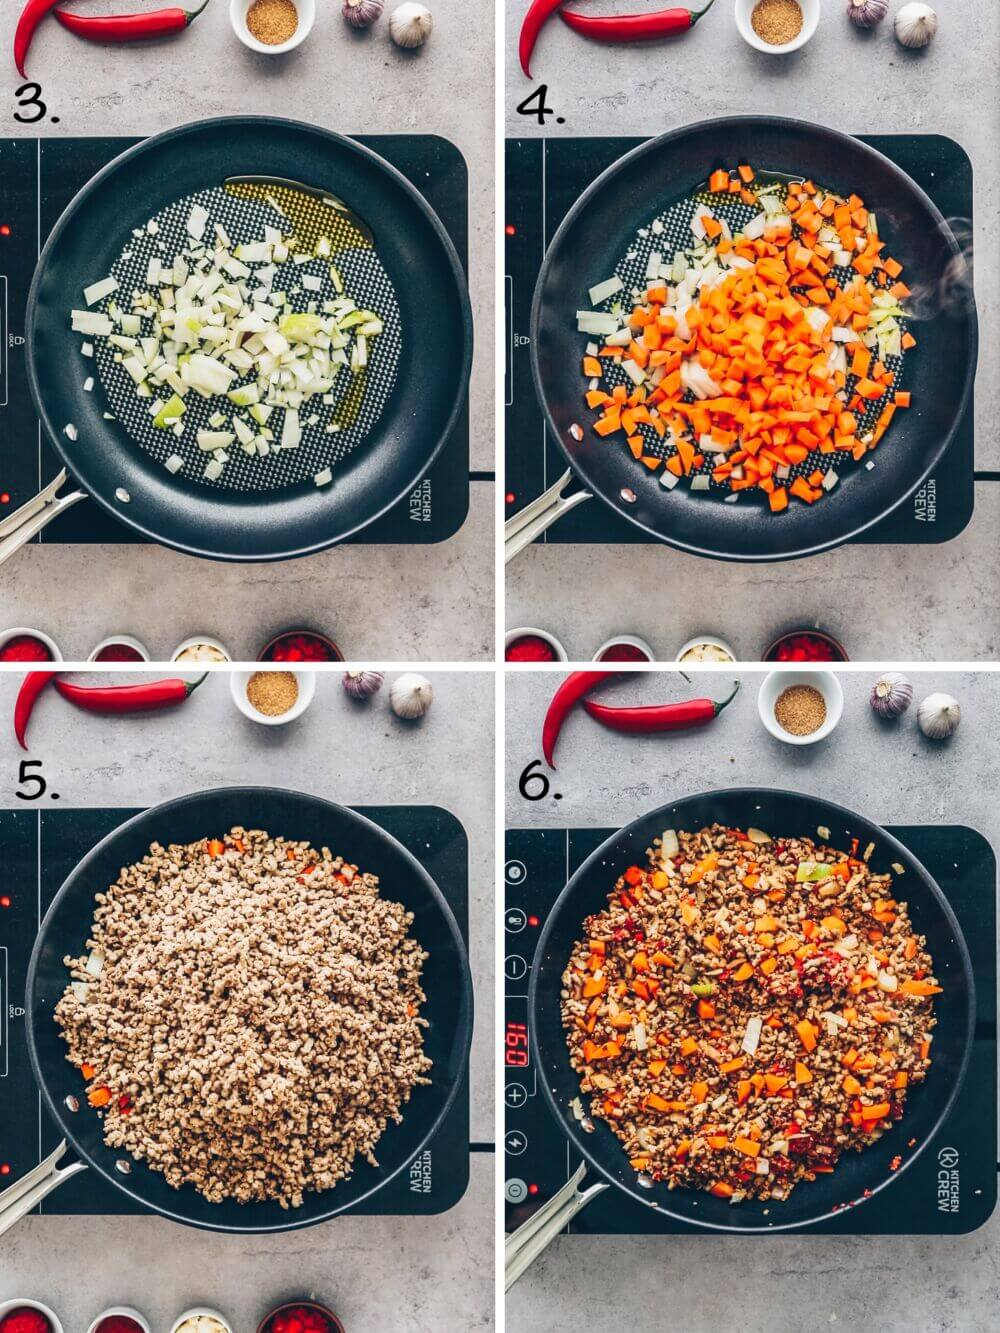 Vegan Chili Sin Carne step-by-step recipe